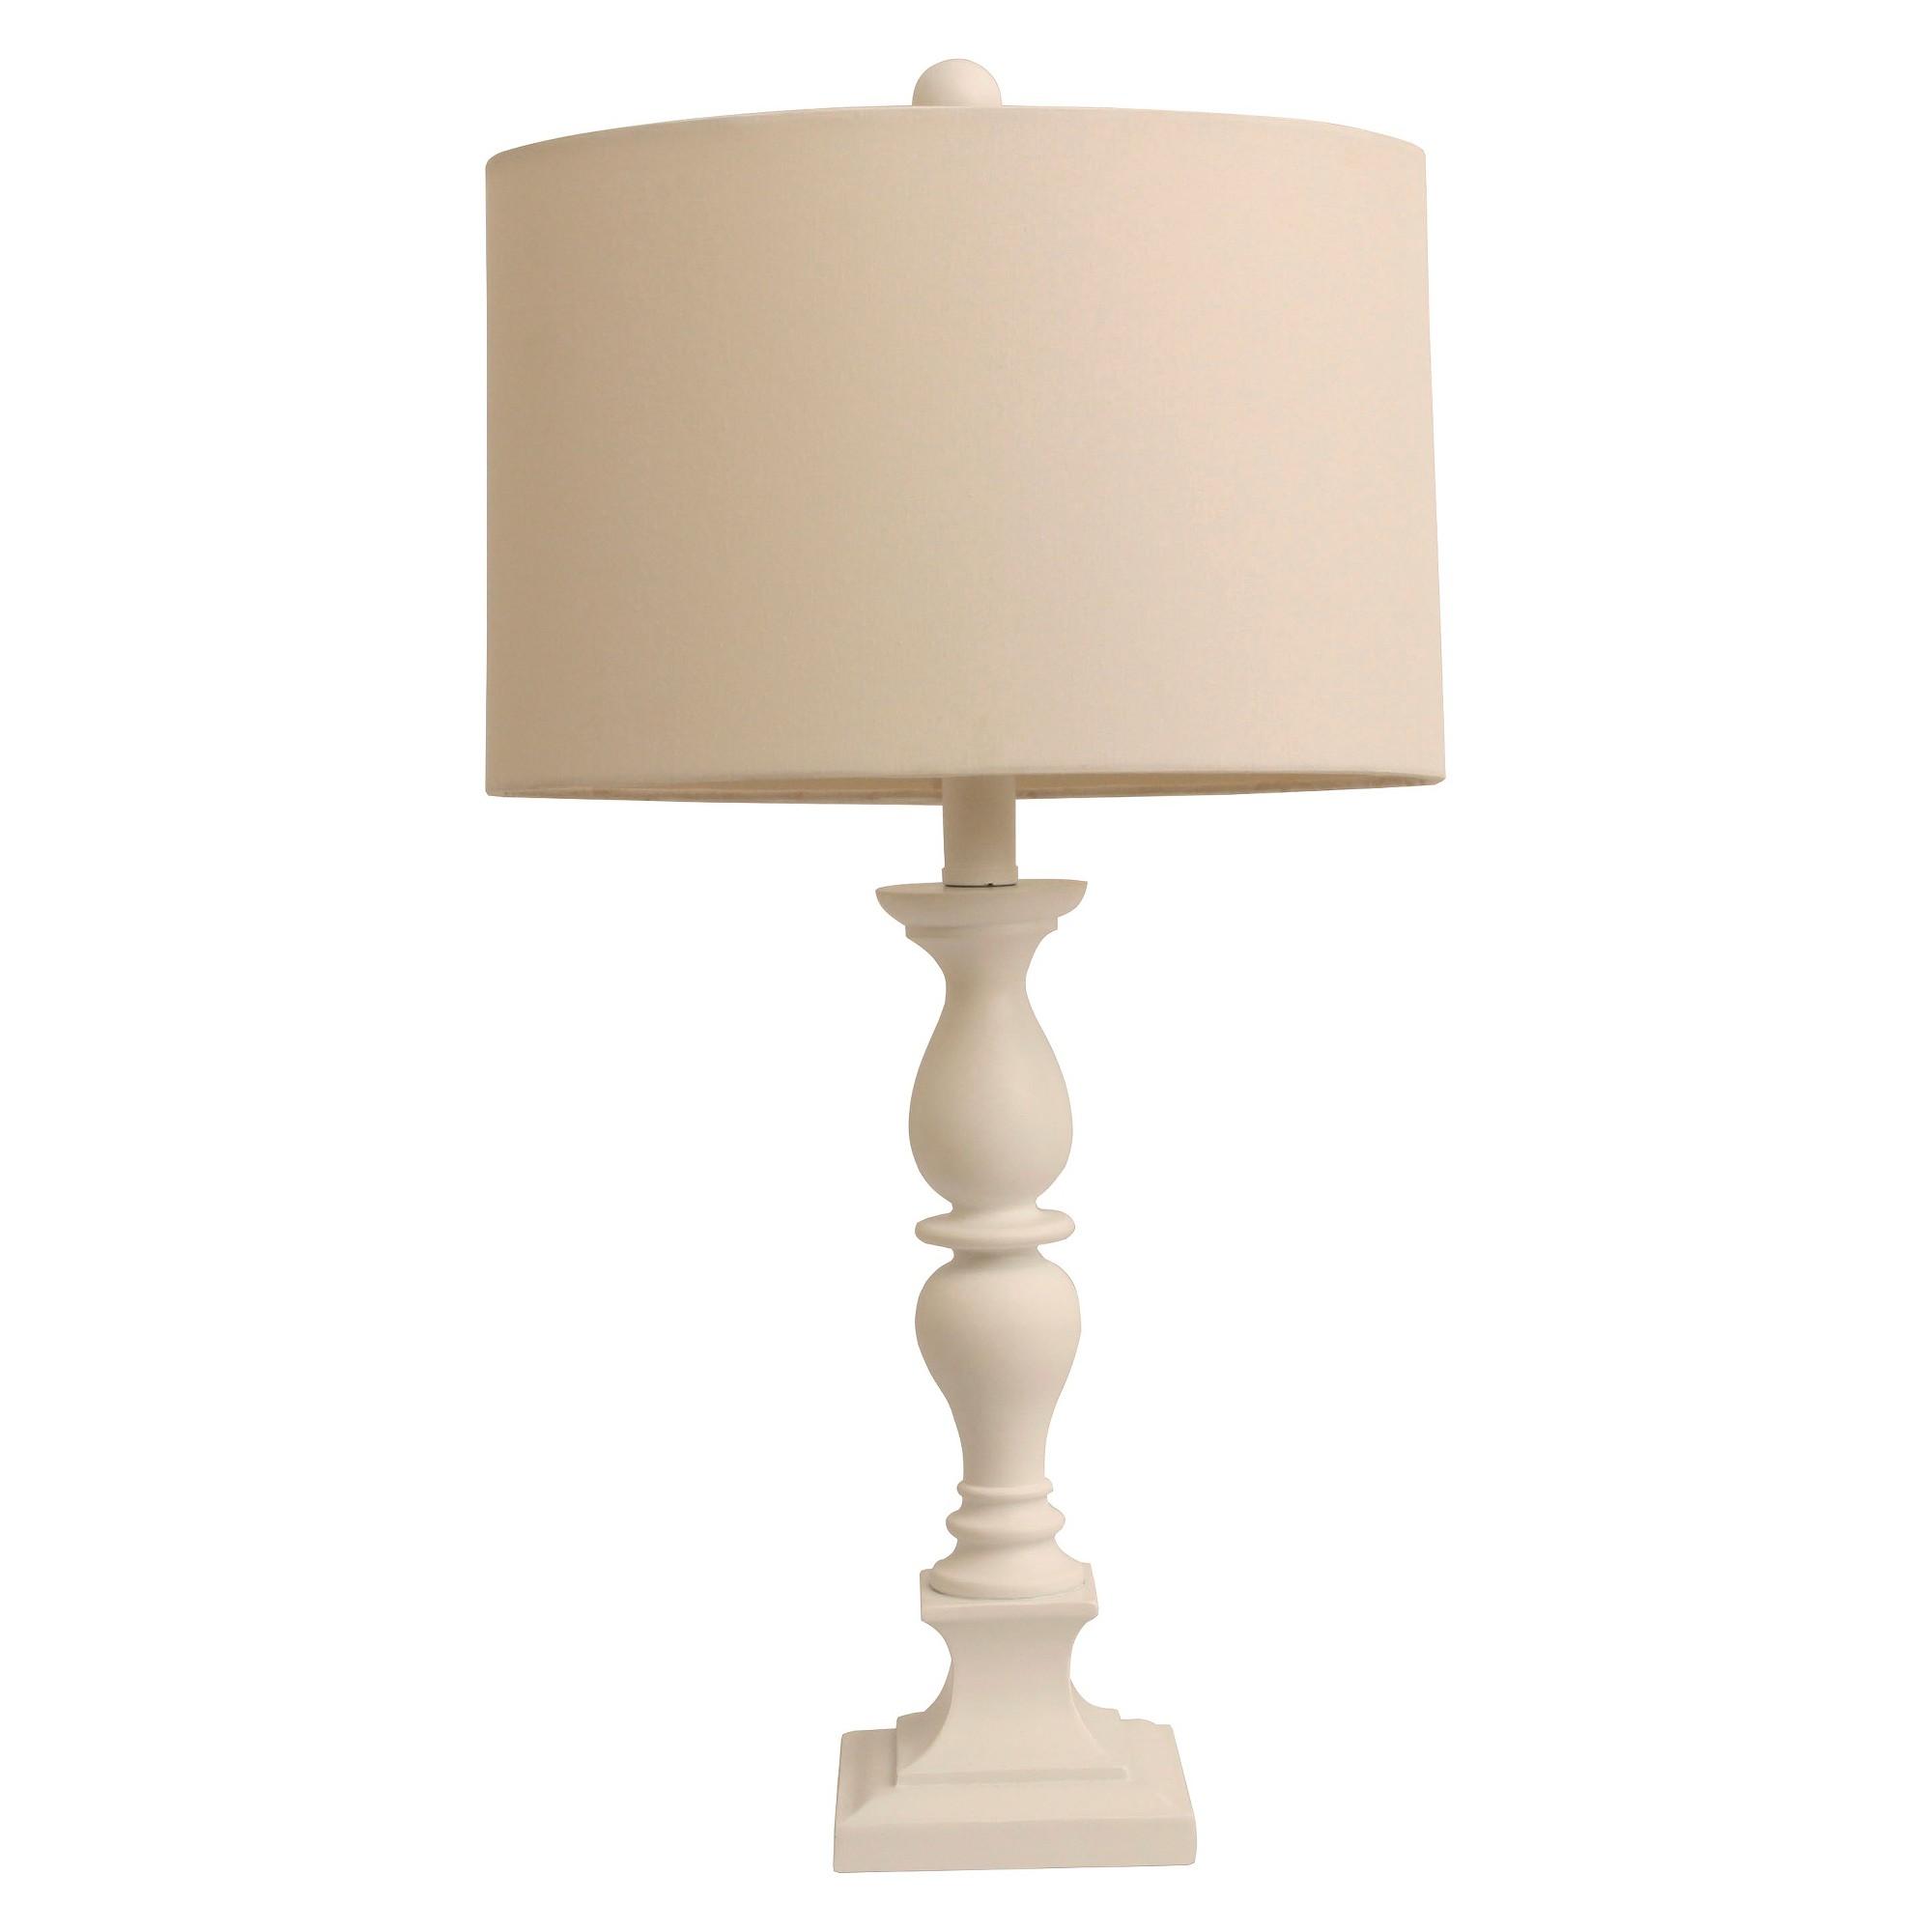 J hunt classic table lamp white off white